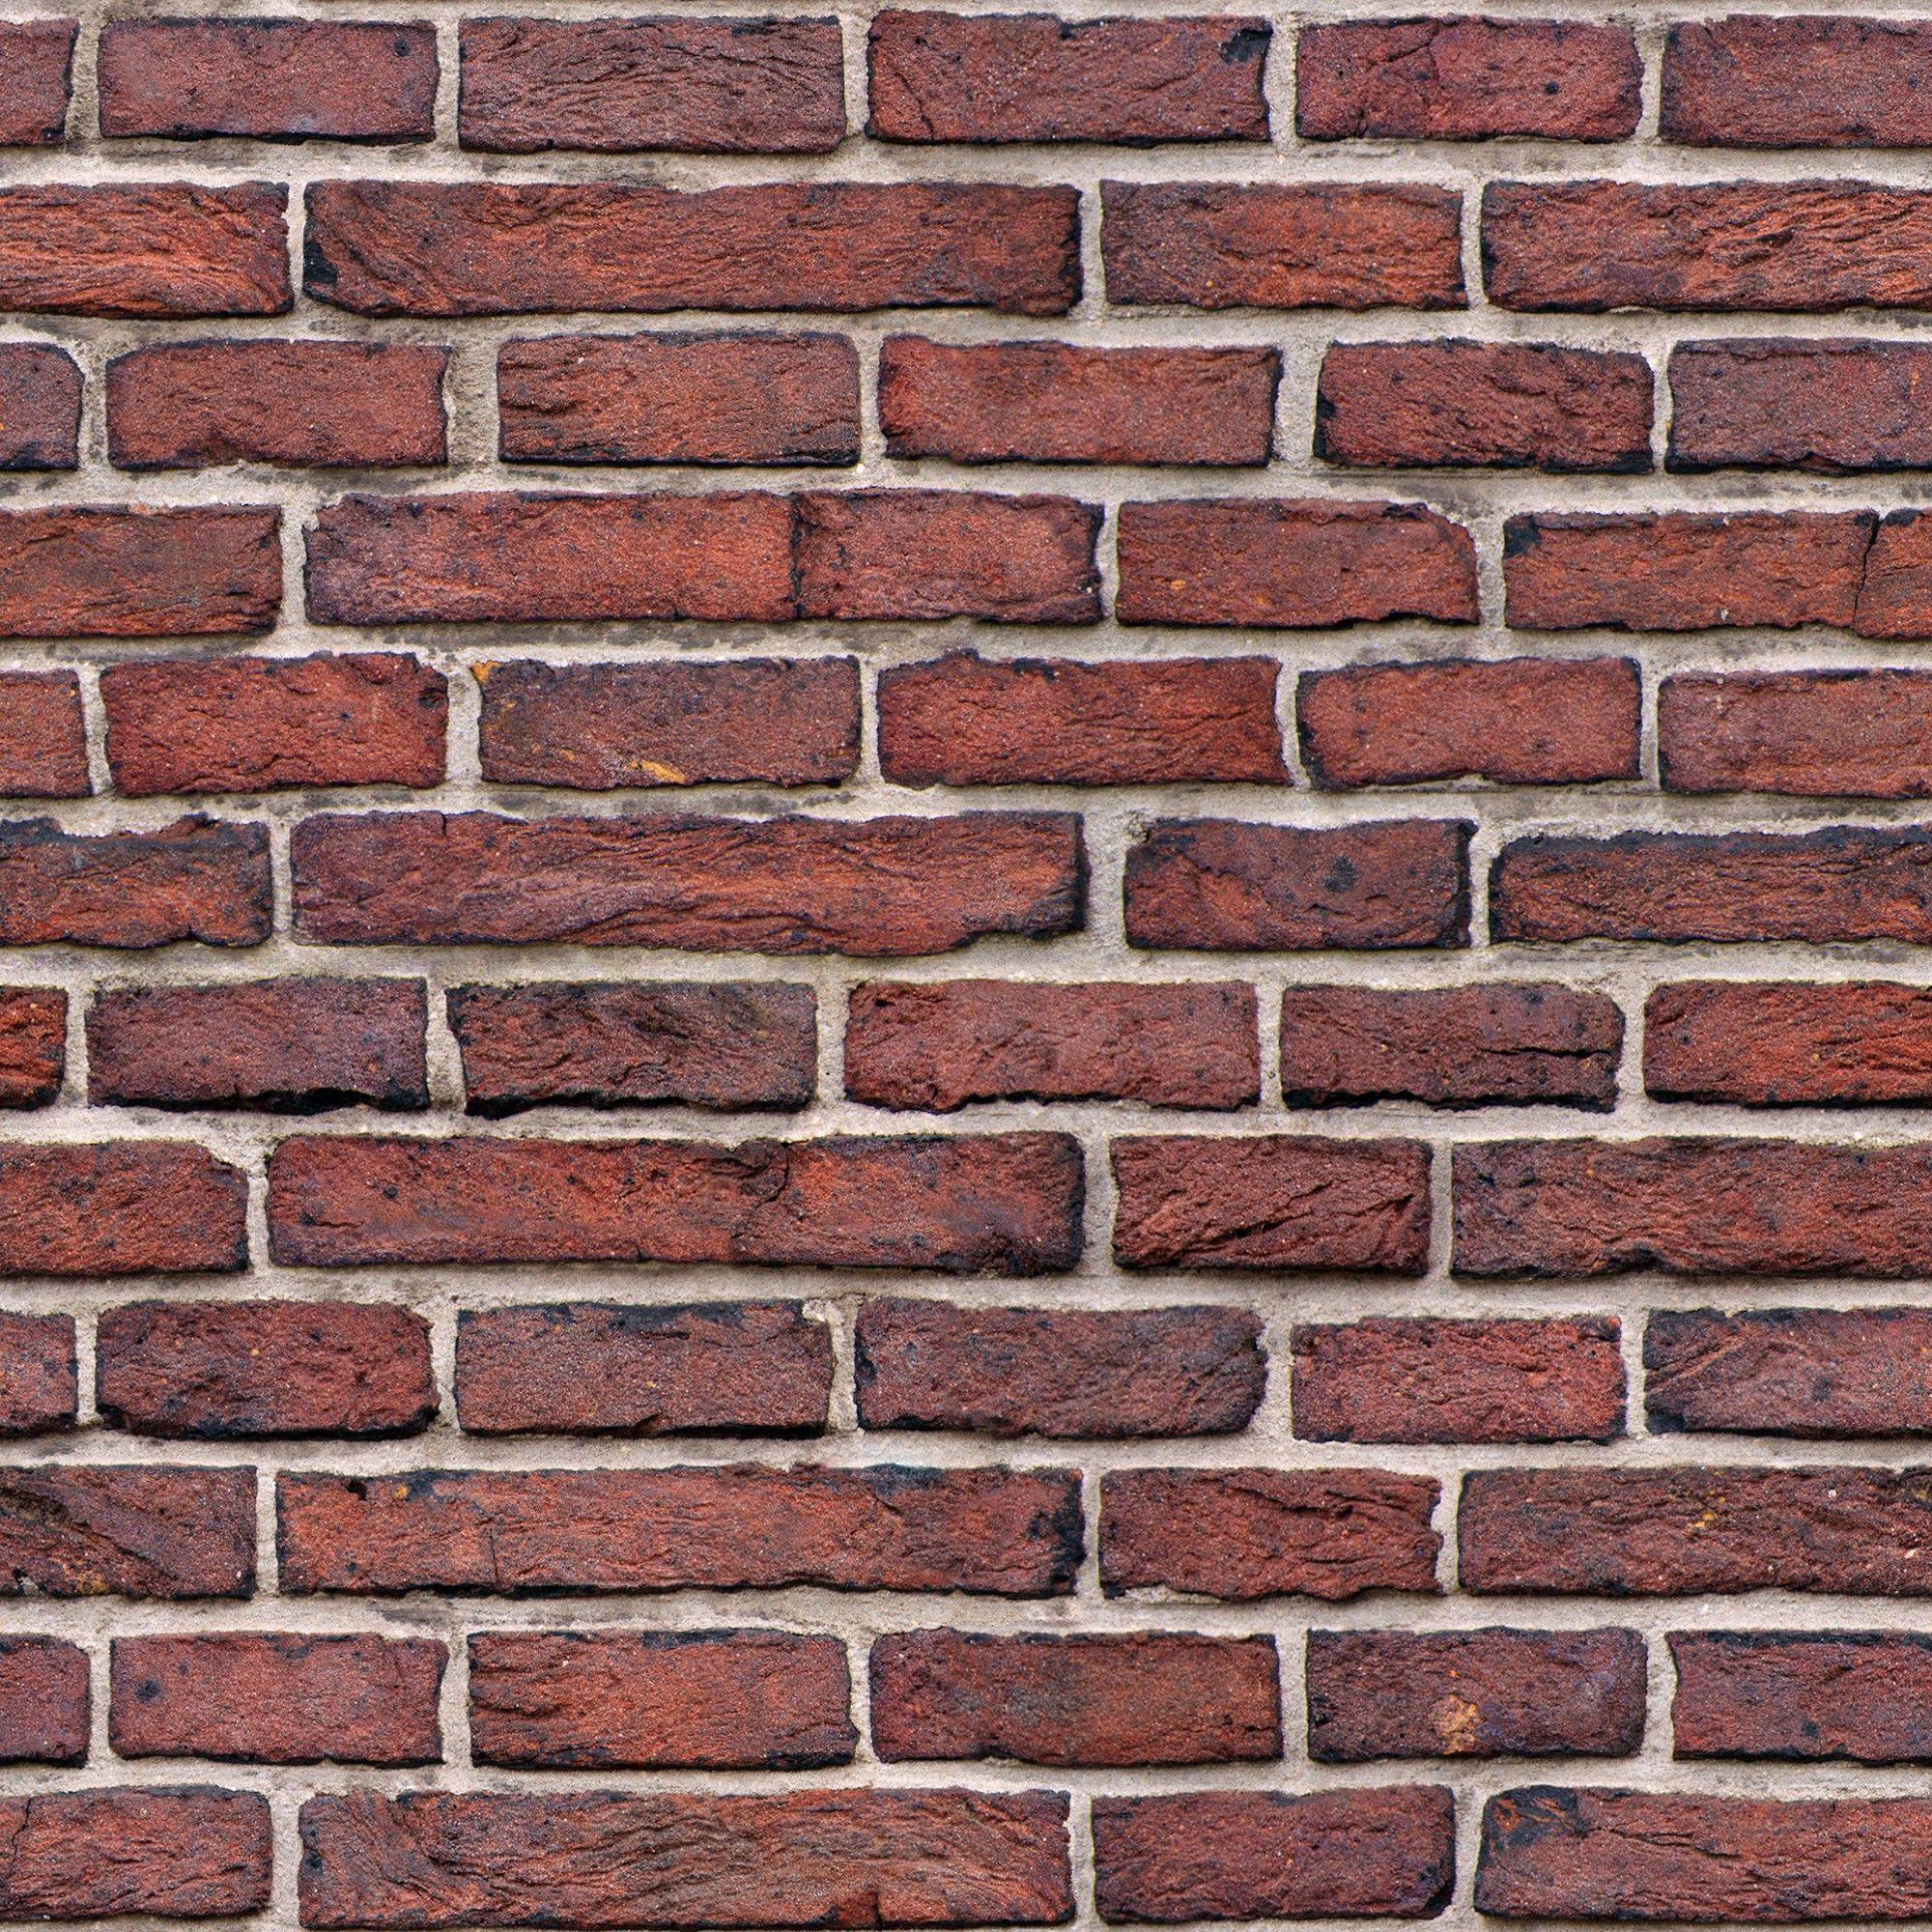 Dark red brick wall seamless texture | Texture | Pinterest ...